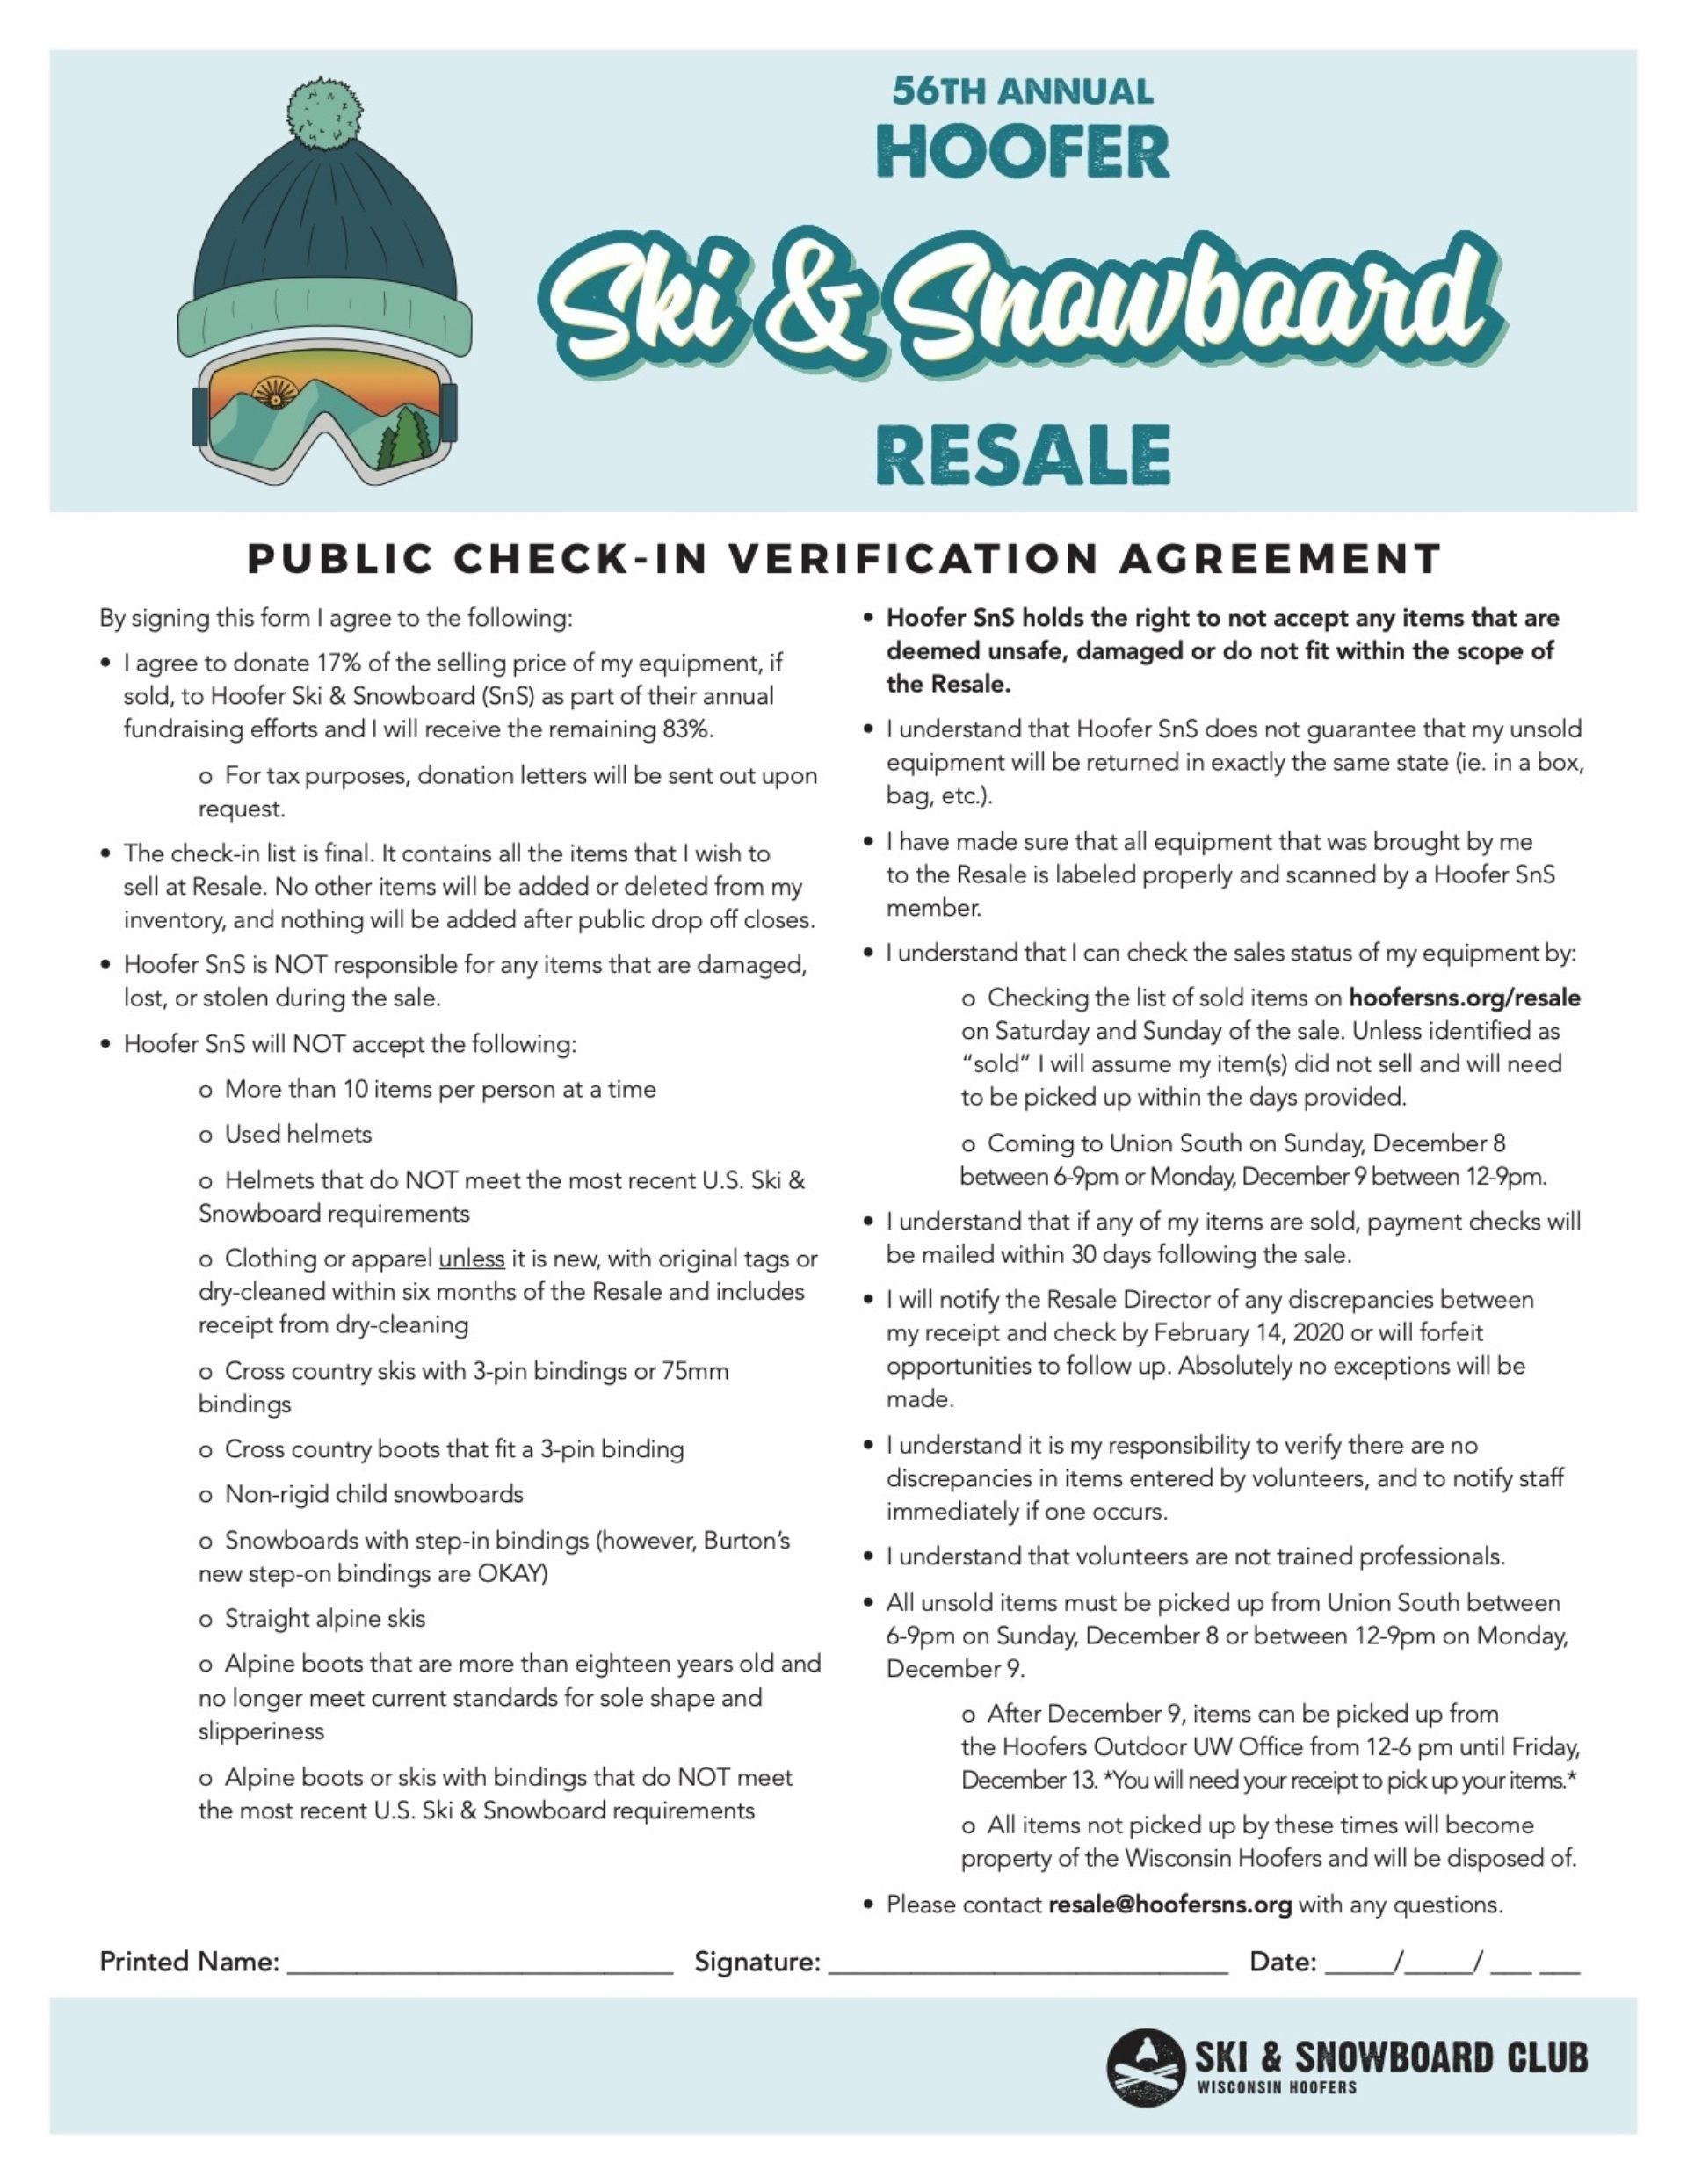 Resale PCI agreement 2019